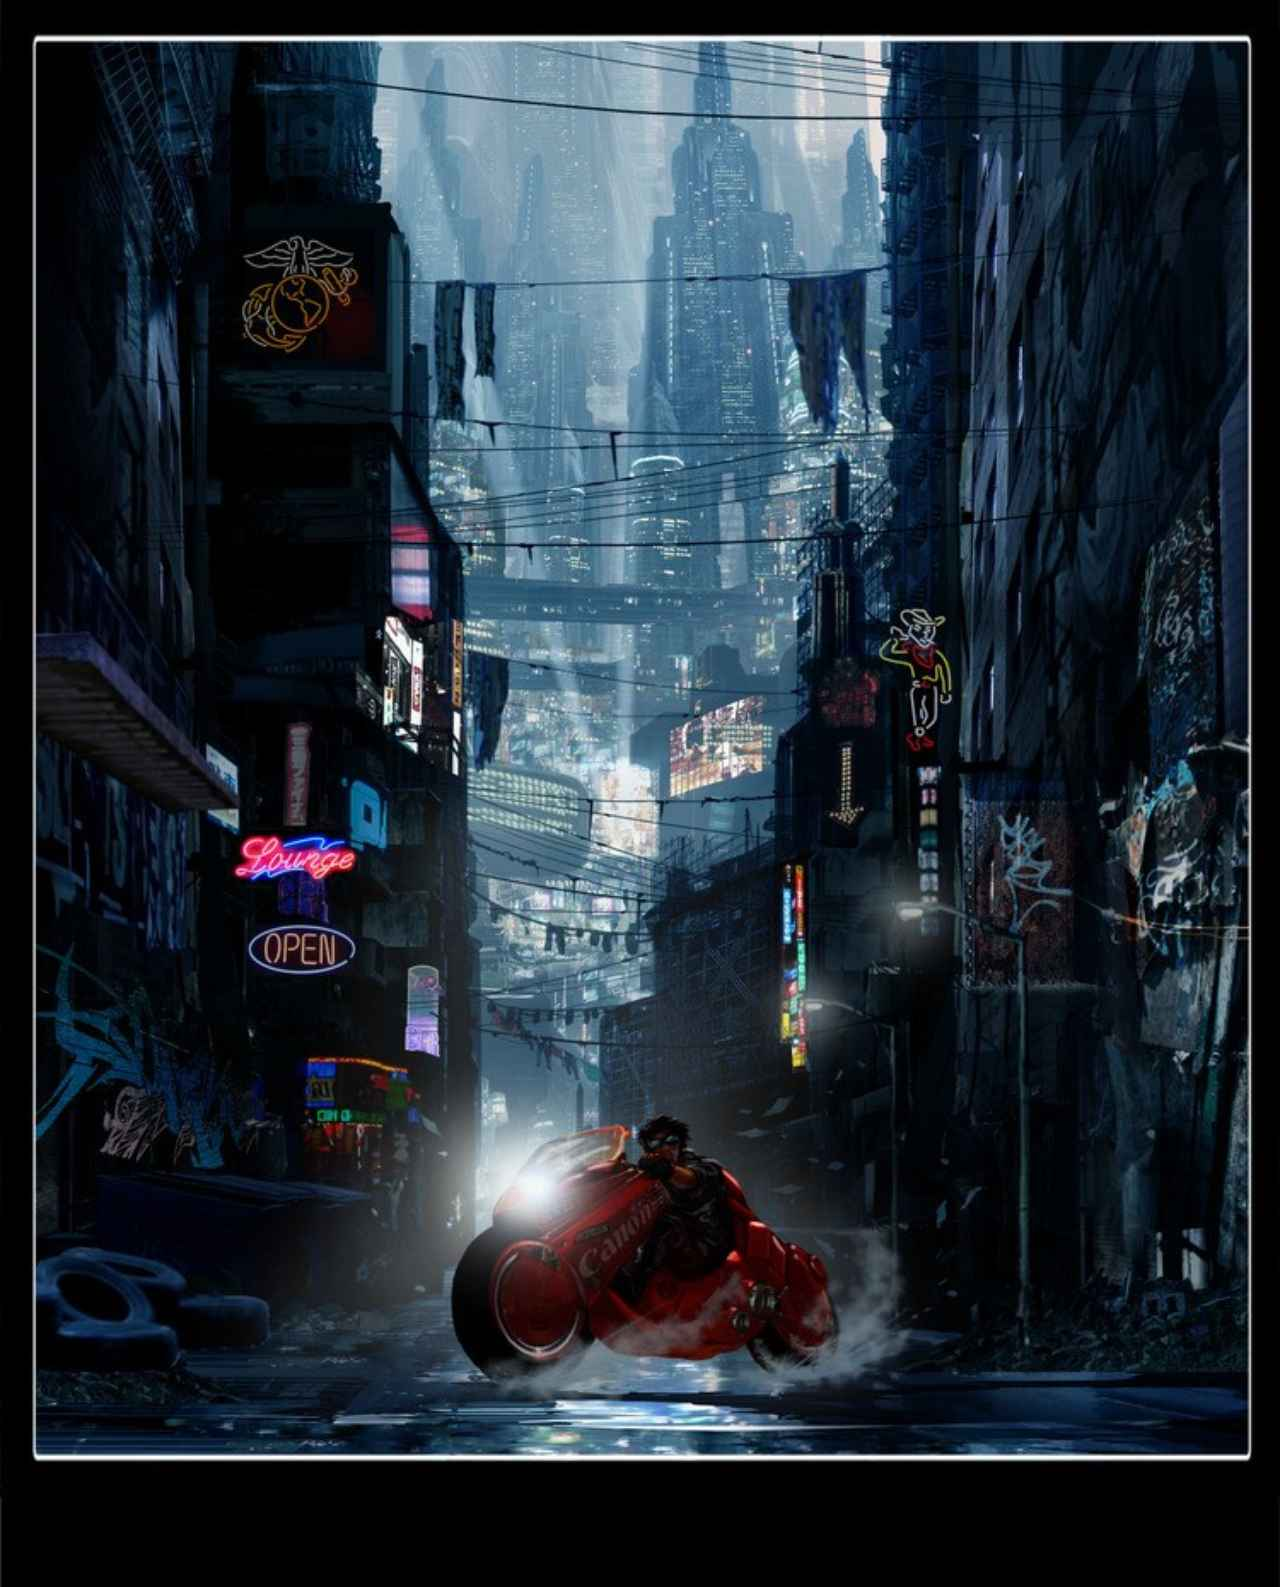 画像1: http://bloody-disgusting.com/movie/3396887/chris-evans-joseph-gordon-levitt-tetsuo-akira-concept-art/